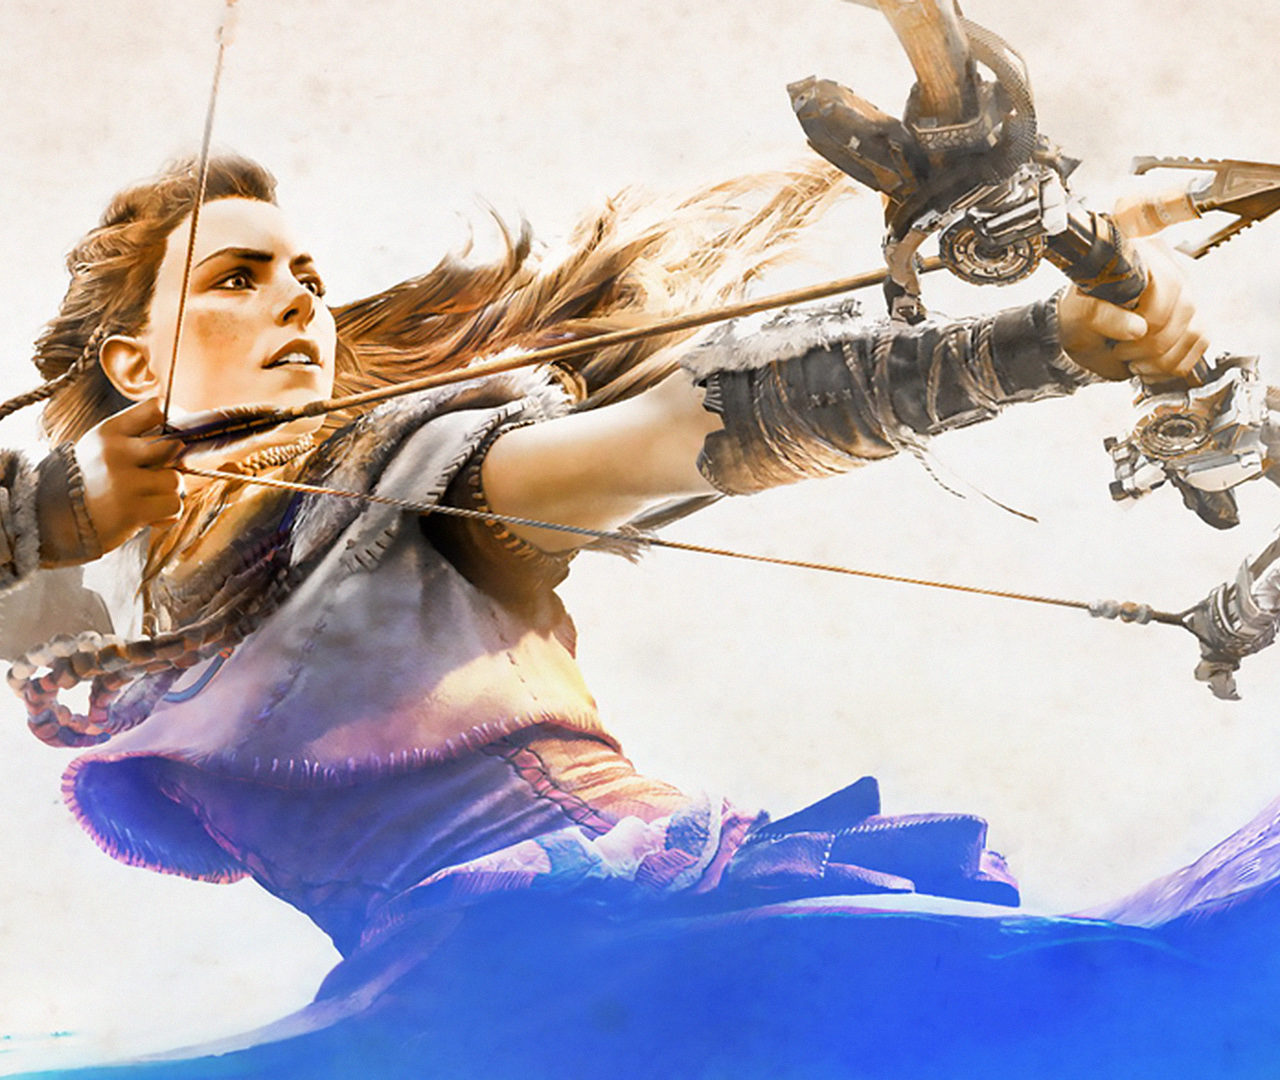 Assassins Creed 2 Hd Wallpapers Horizon Zero Dawn Aloy Hd Wallpapers Hd Wallpapers